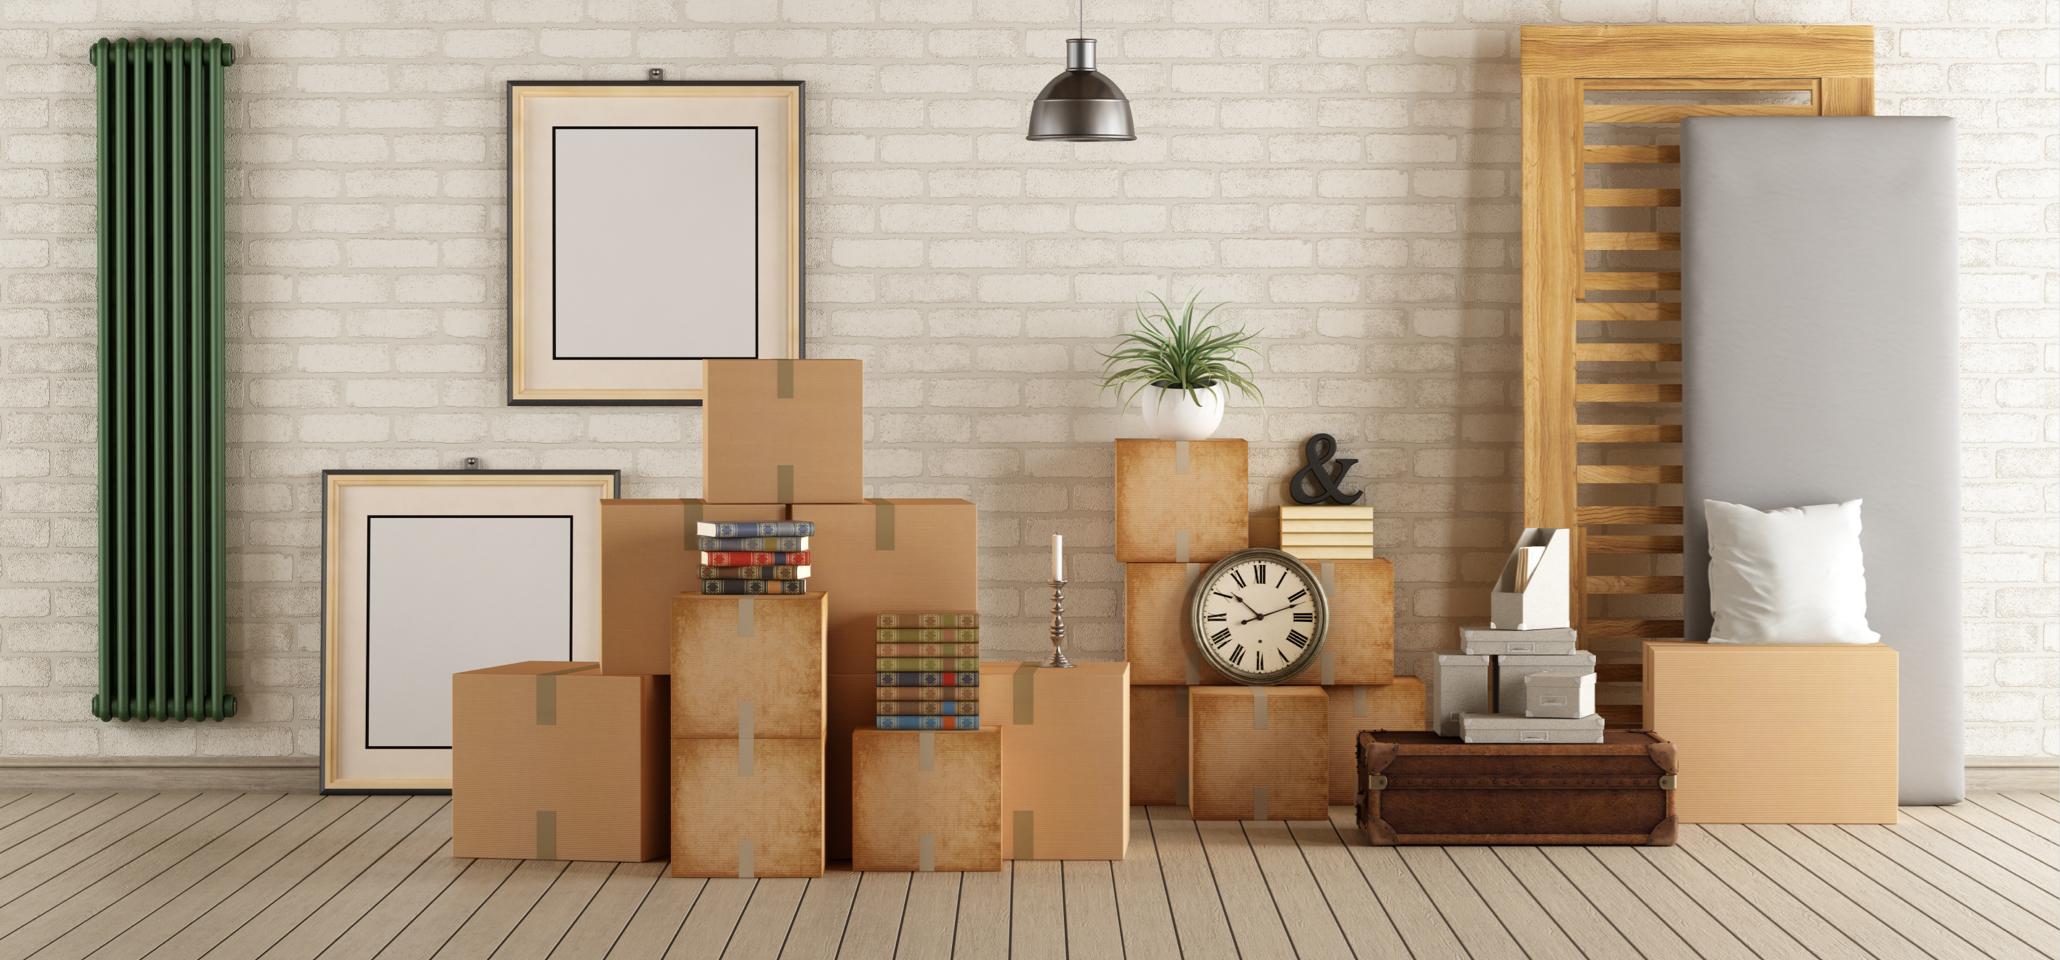 Three key reasons for organising self-storage in winter